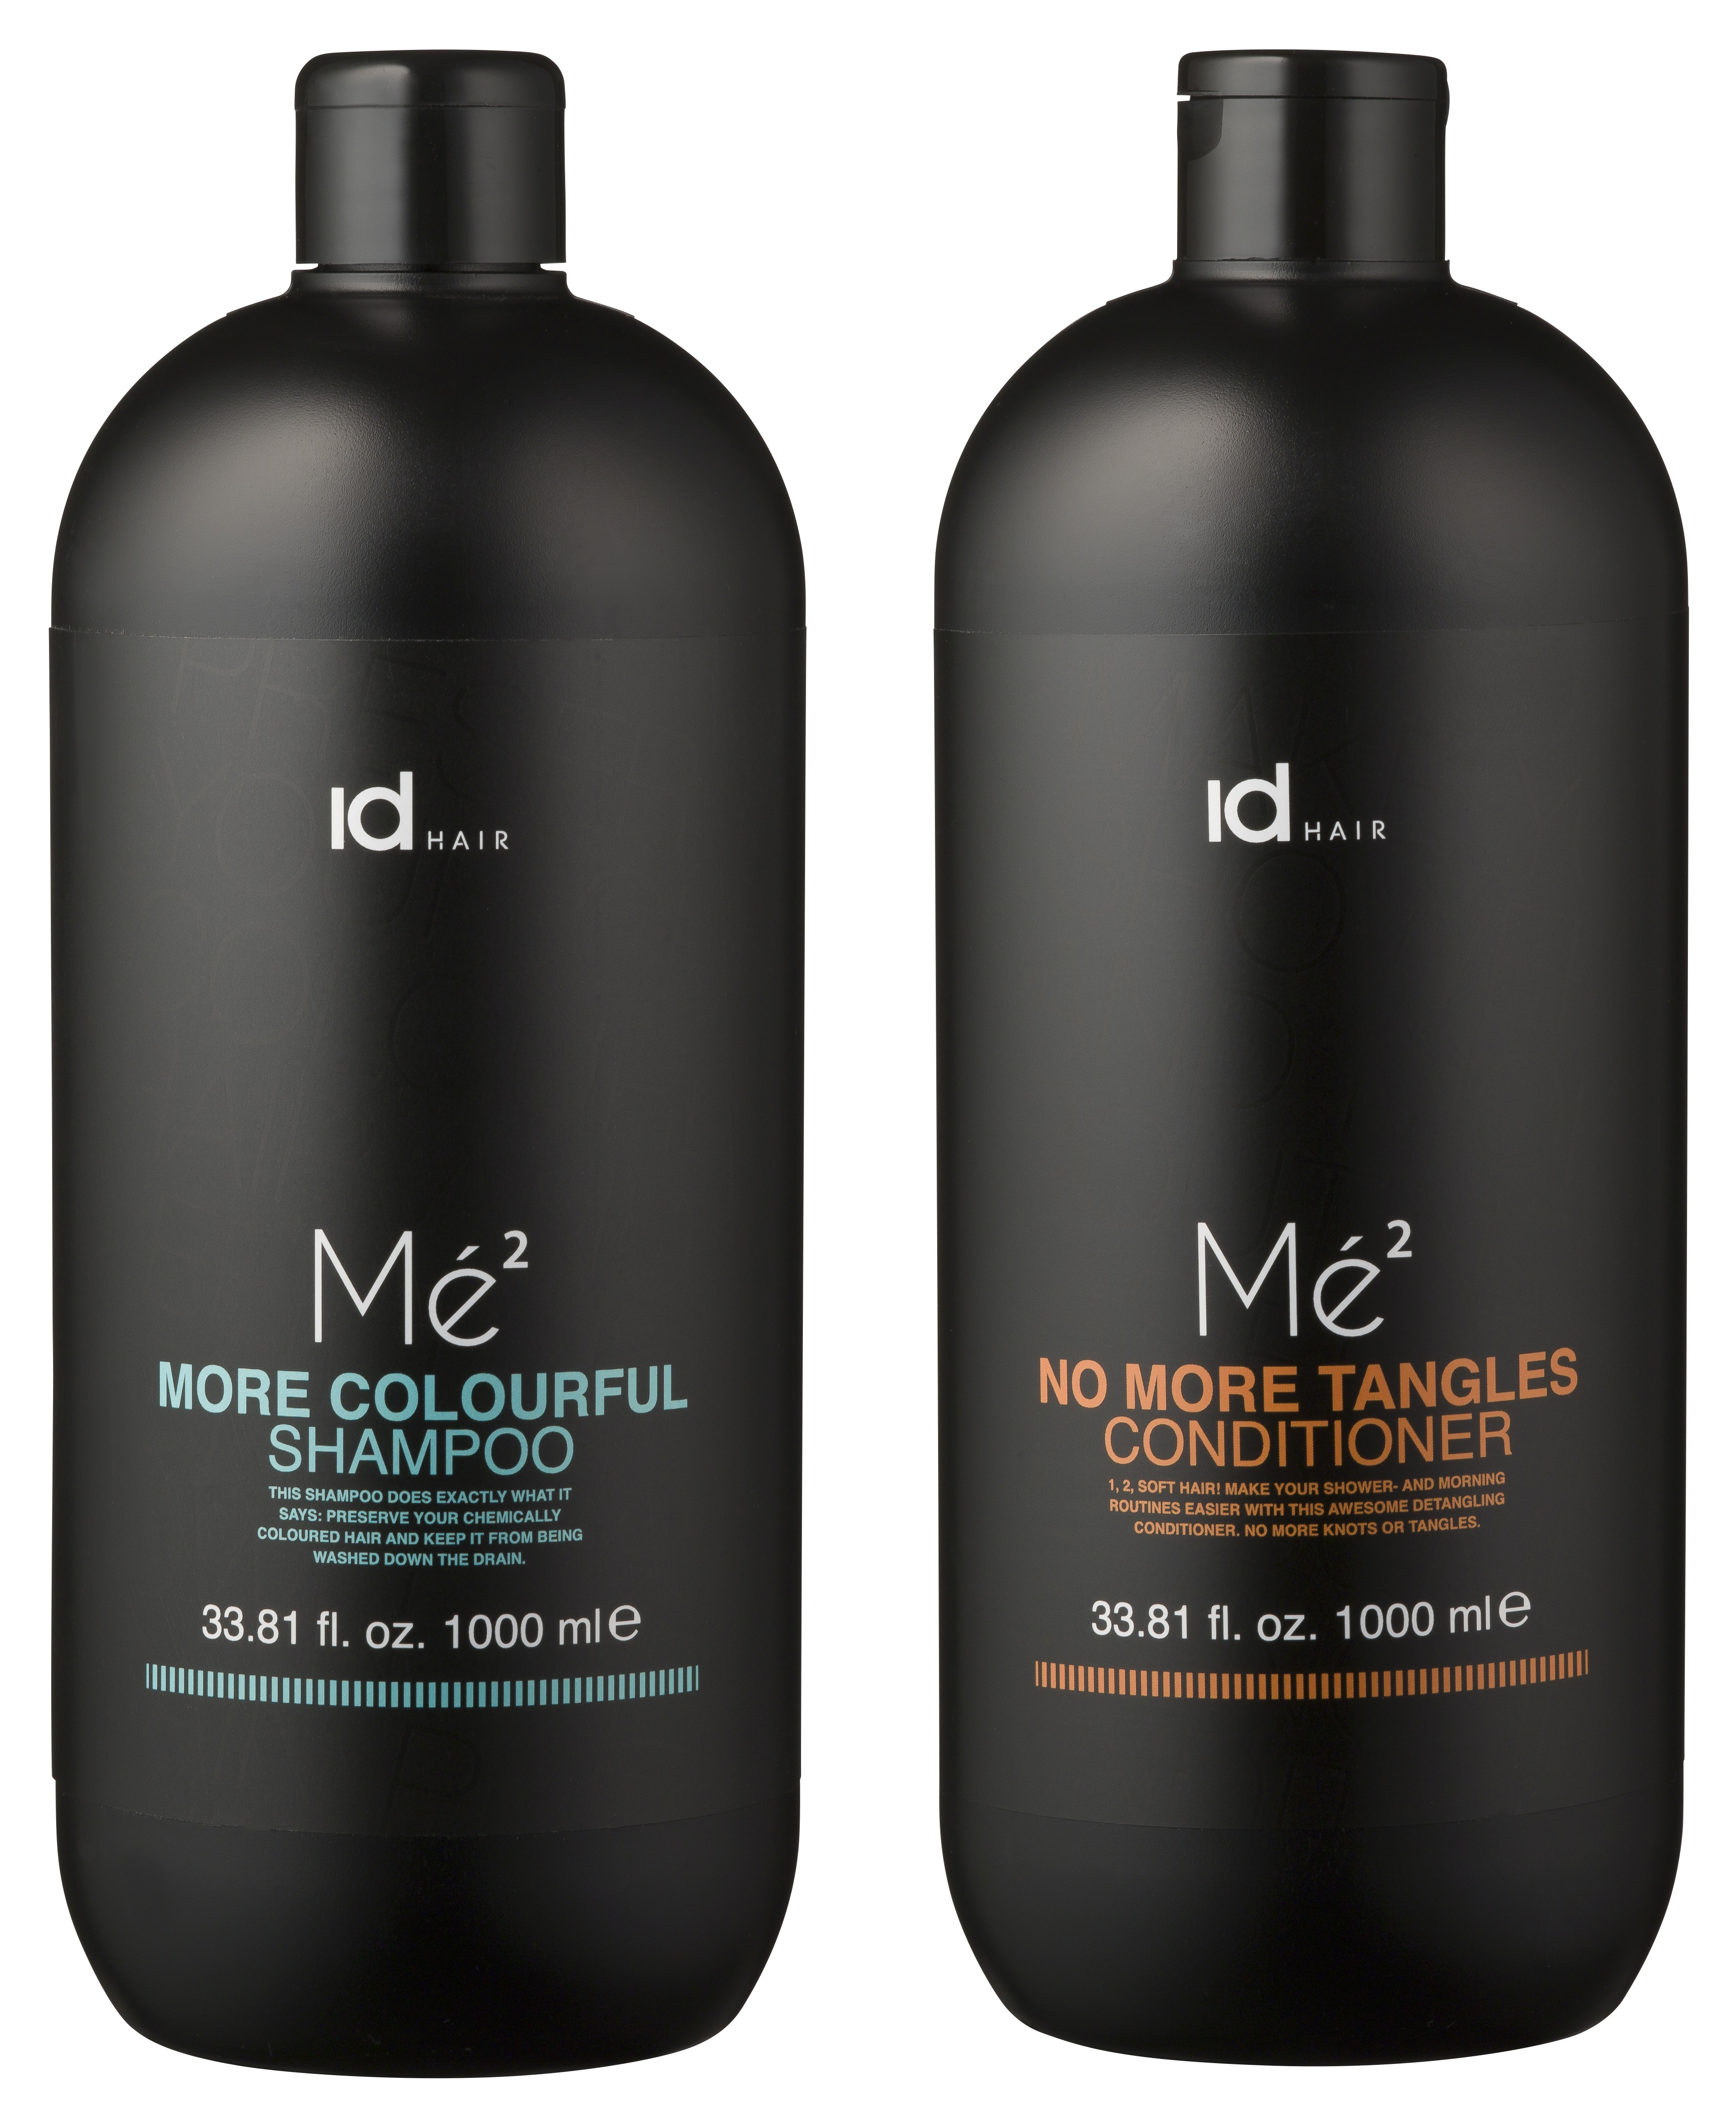 IdHAIR - Mé2 Shampoo Colour 1000 ml + Conditioner 1000 ml